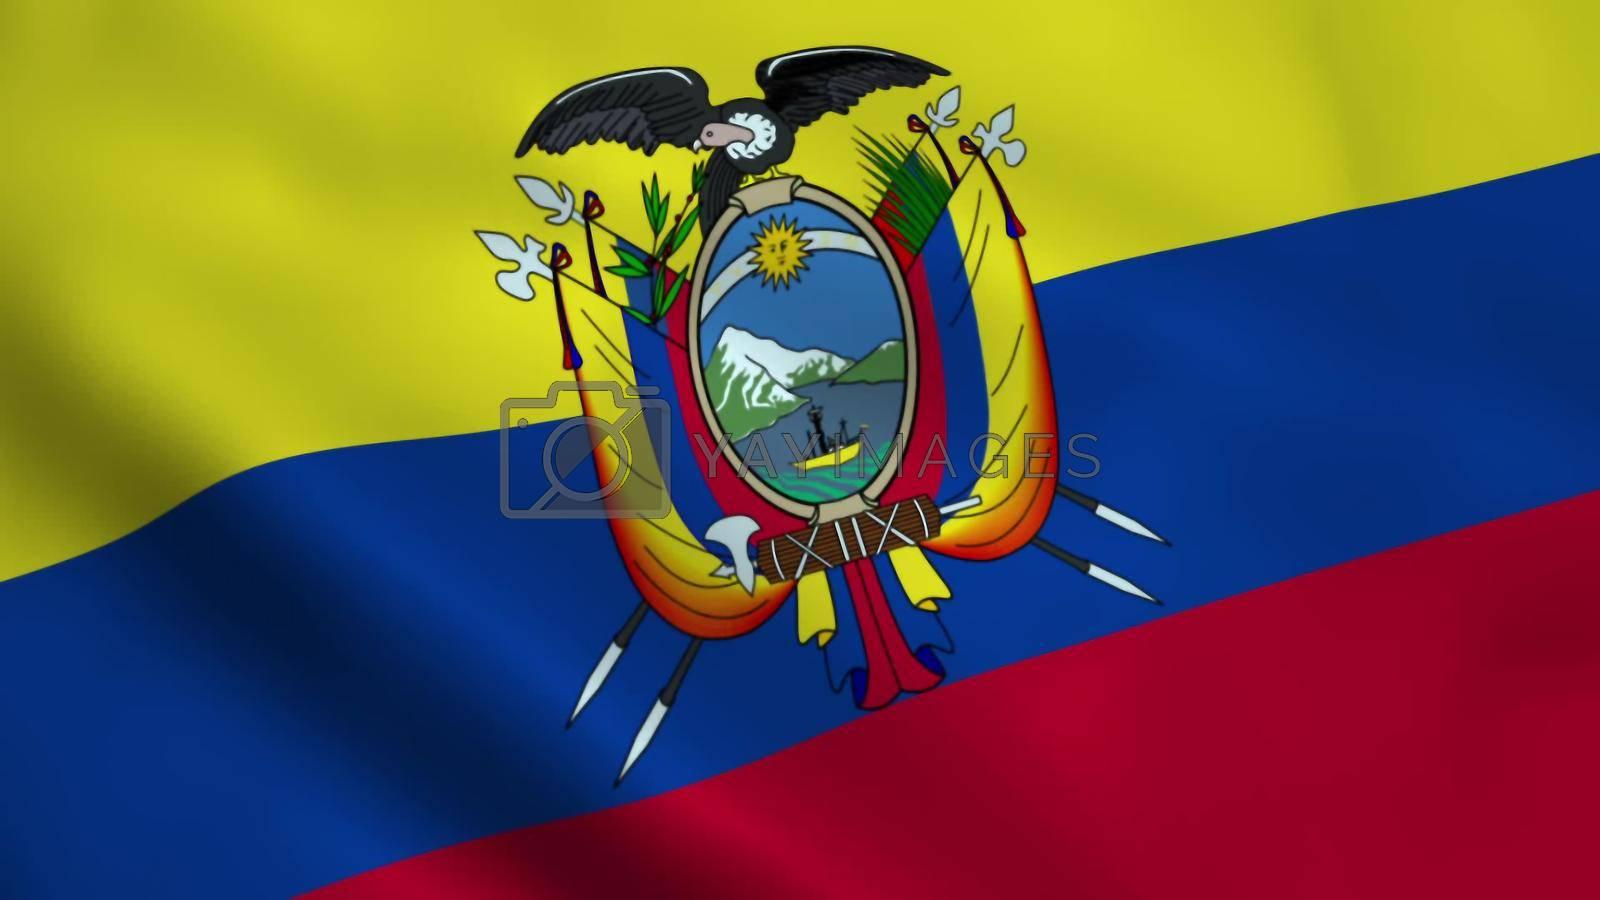 Realistic Ecuador flag waving in the wind.